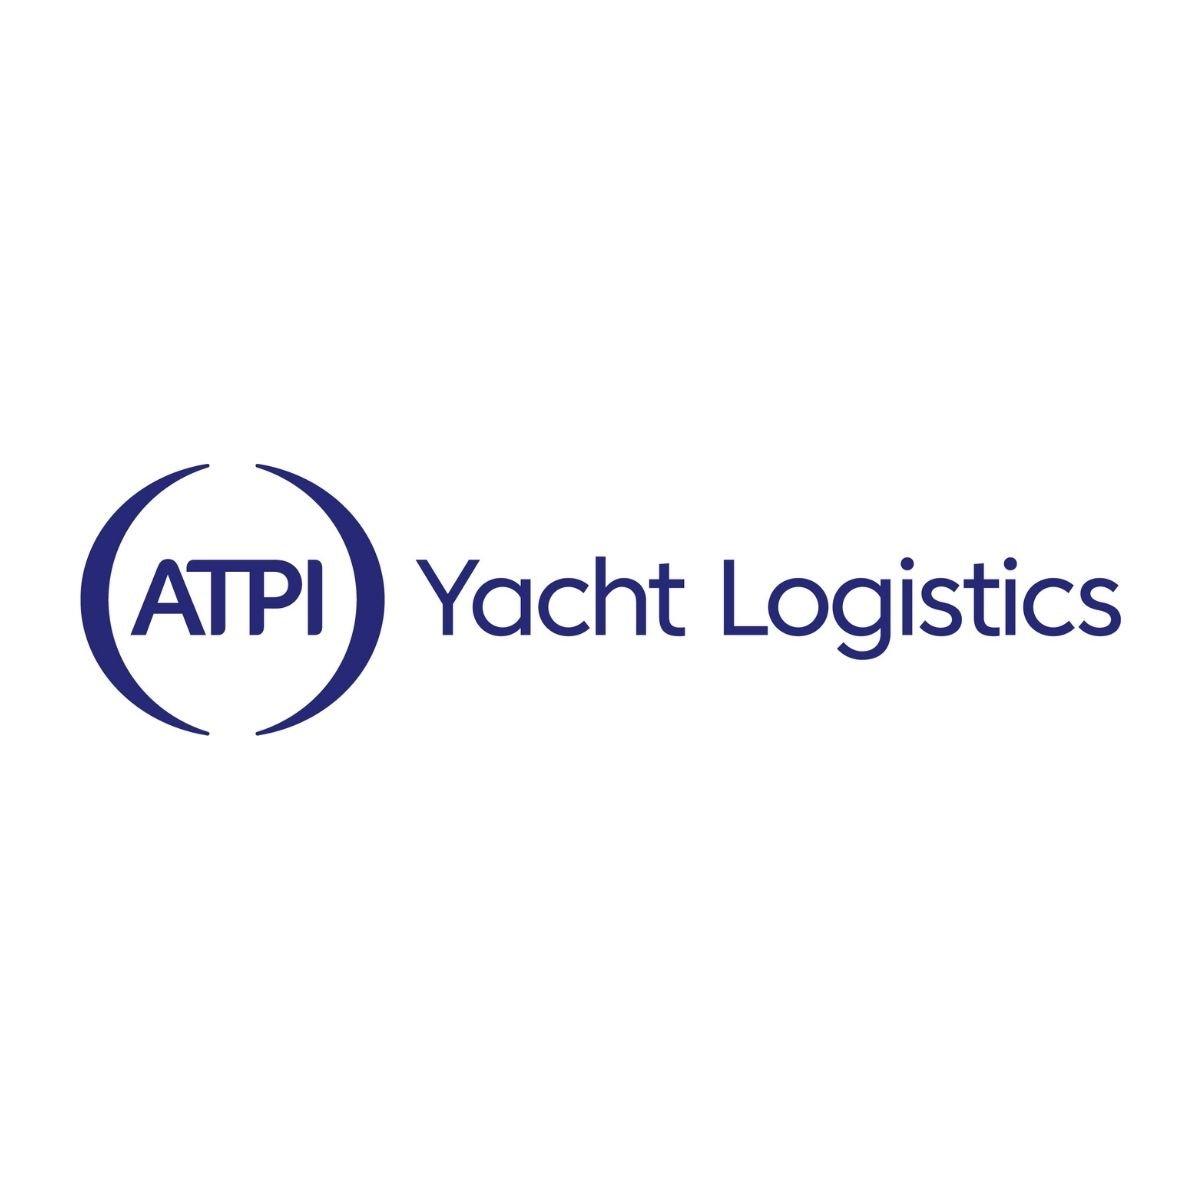 ATPI Yacht Logistics